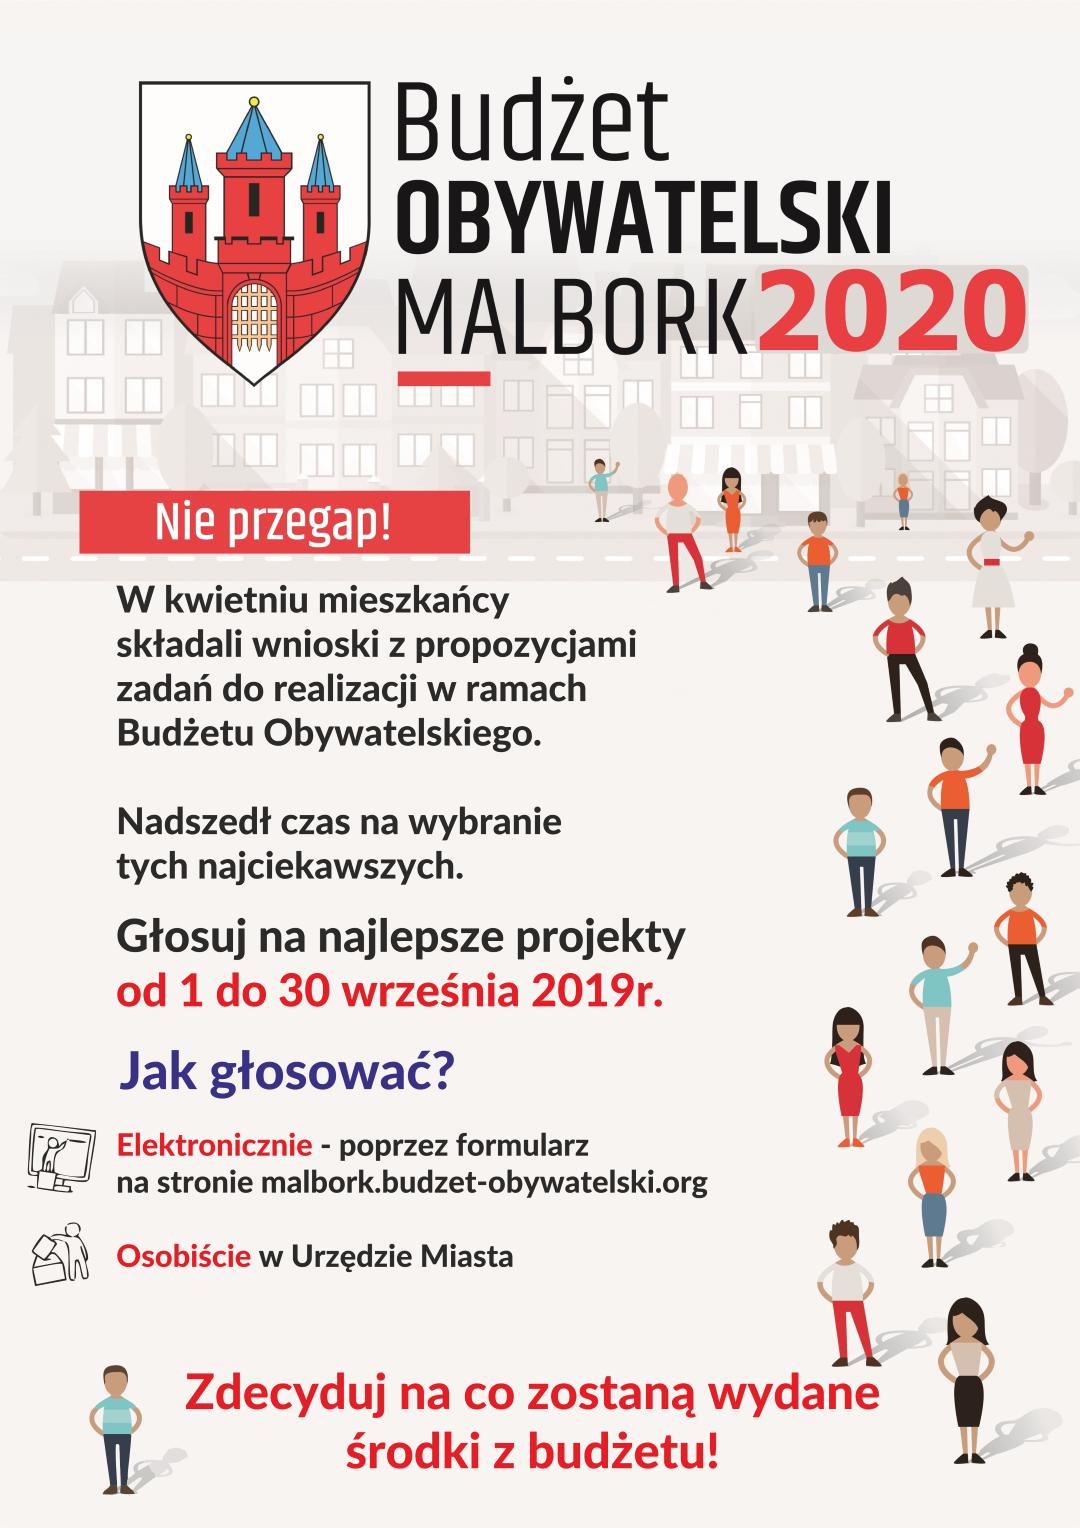 http://m.82-200.pl/2019/08/orig/glosuj-4827.png